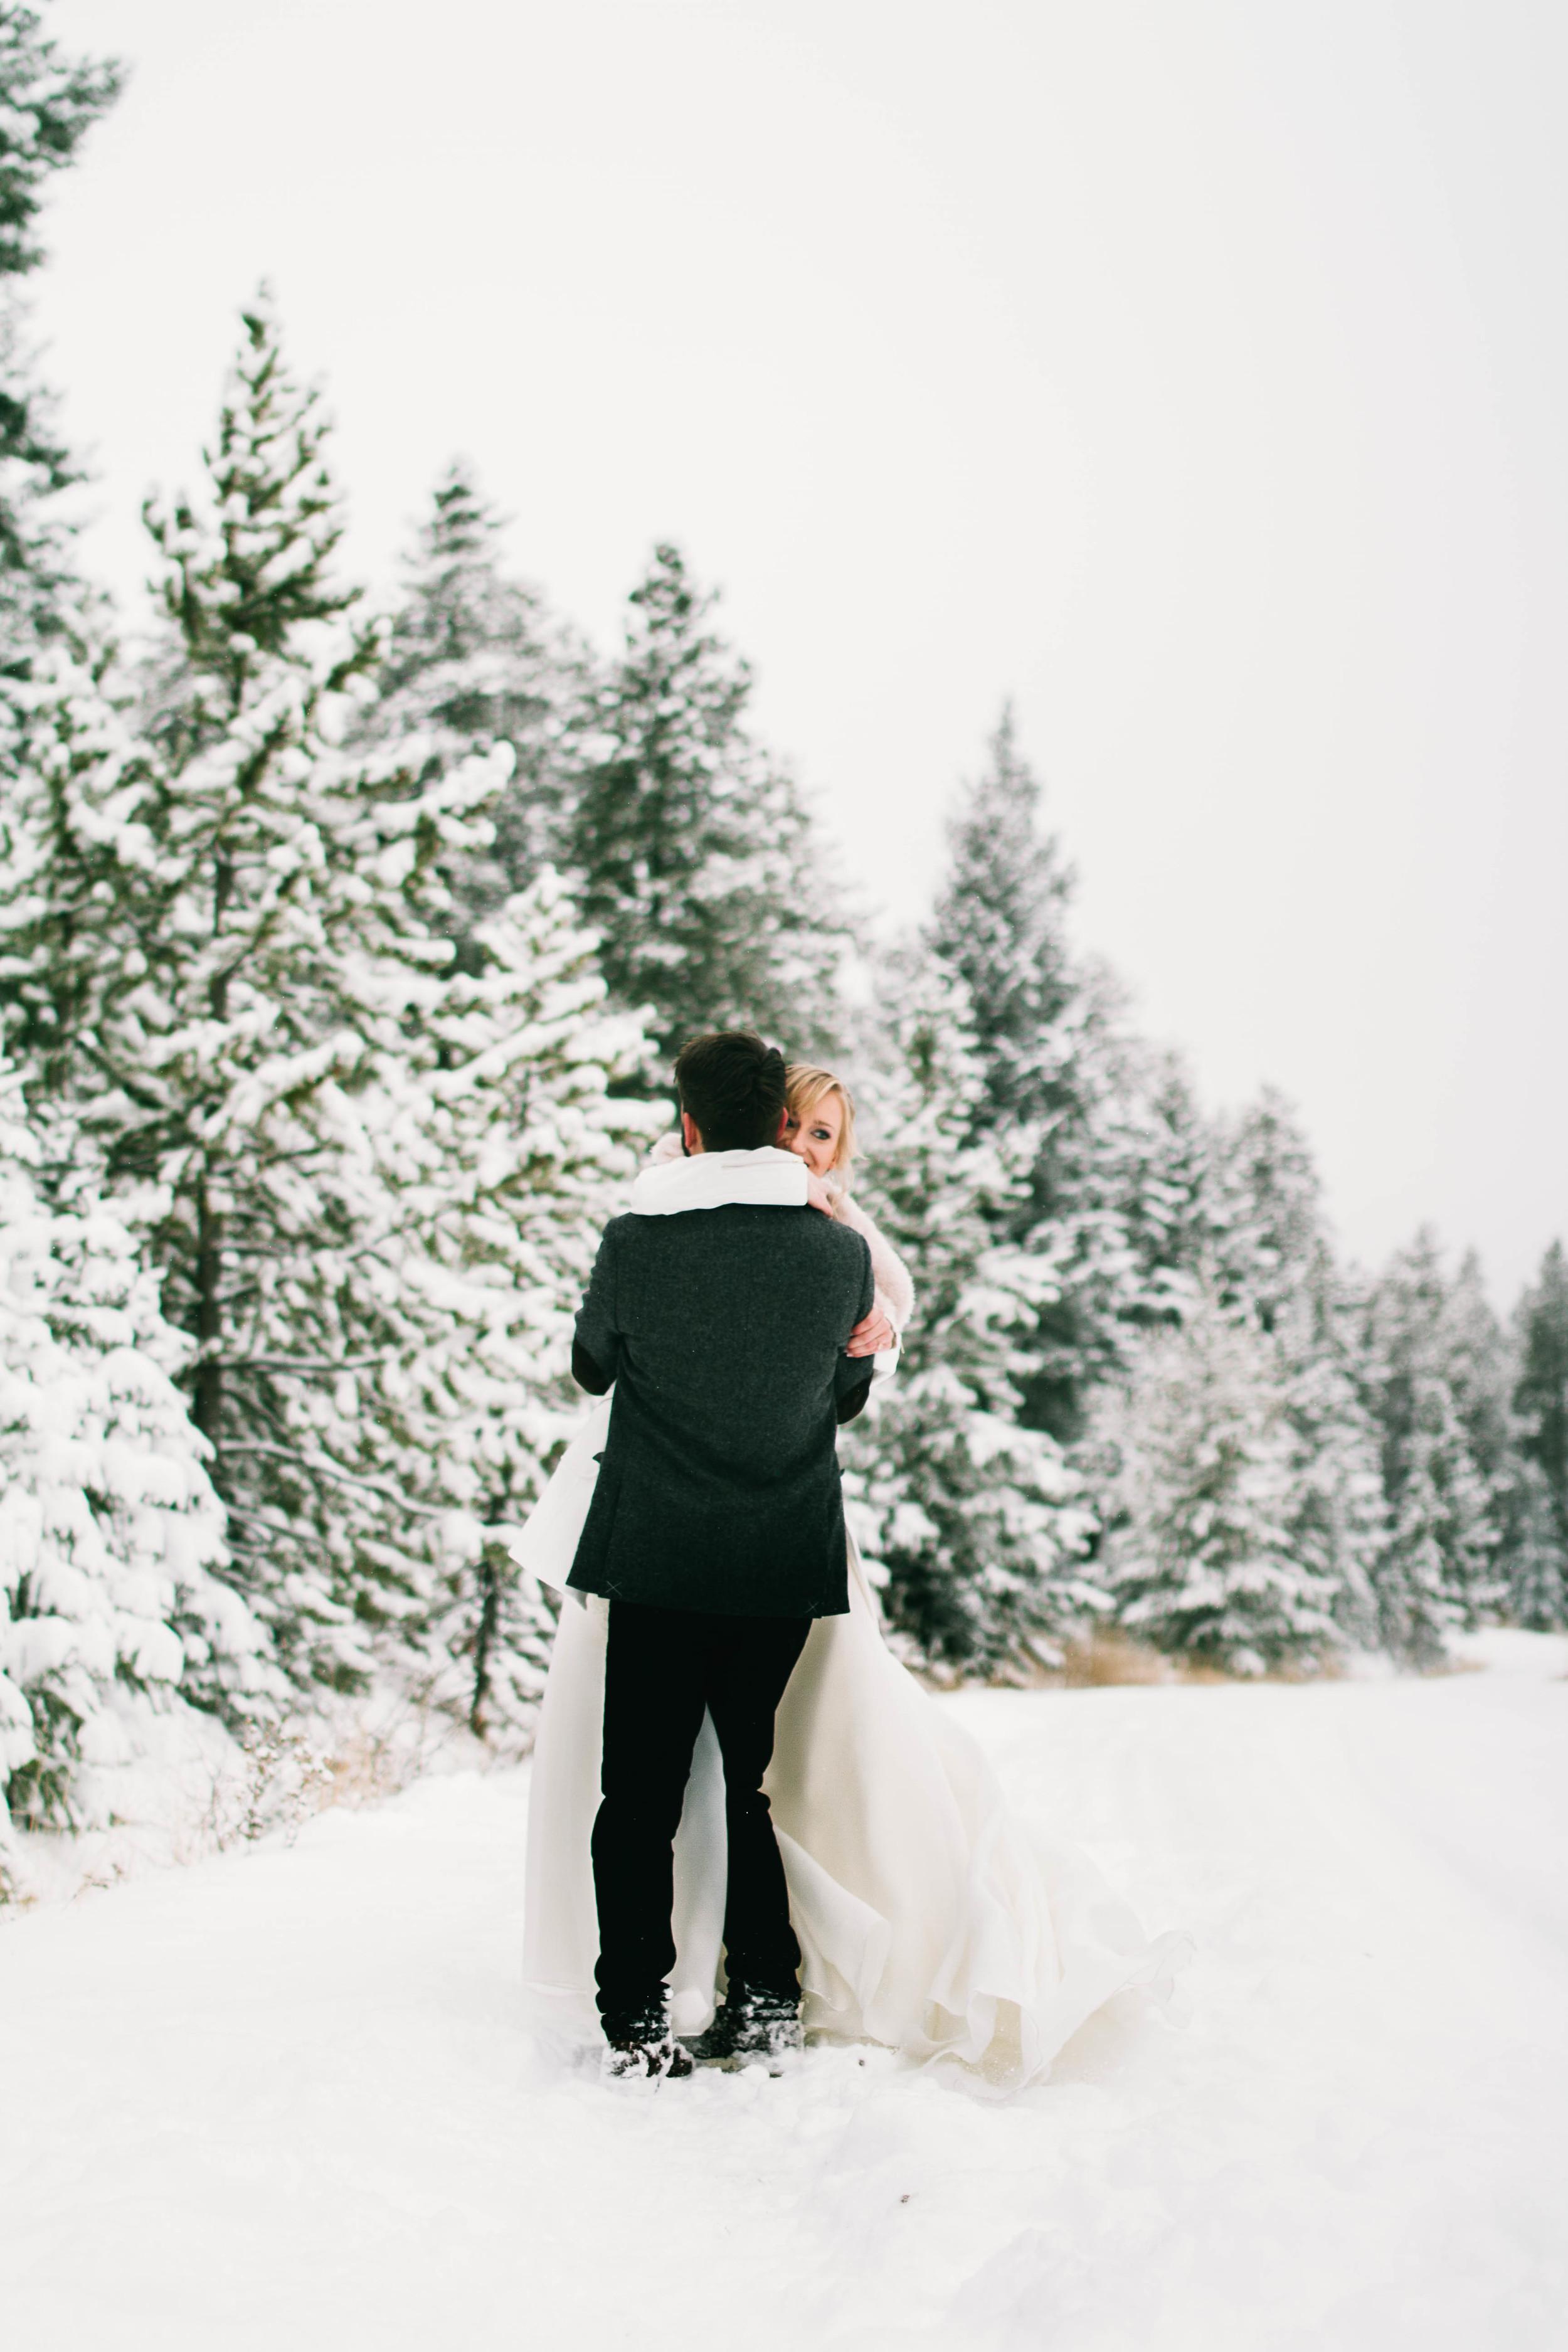 Bonin Wedding - Madeleine Bonin Photography-5797.jpg